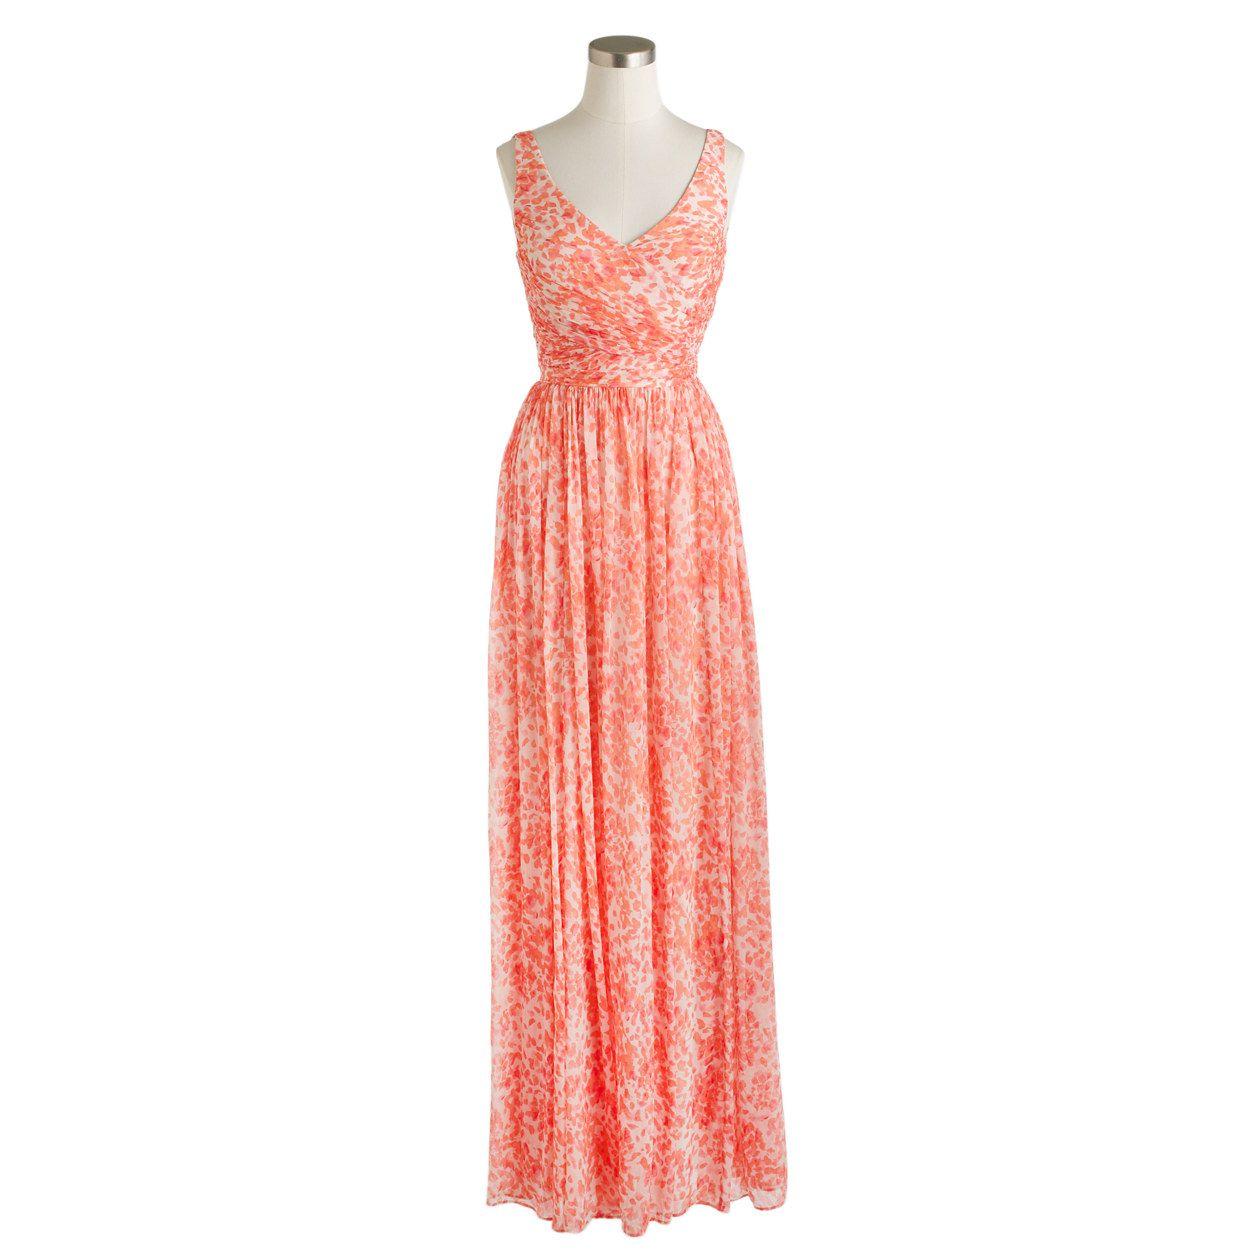 Heidi long dress in watercolor silk chiffon products